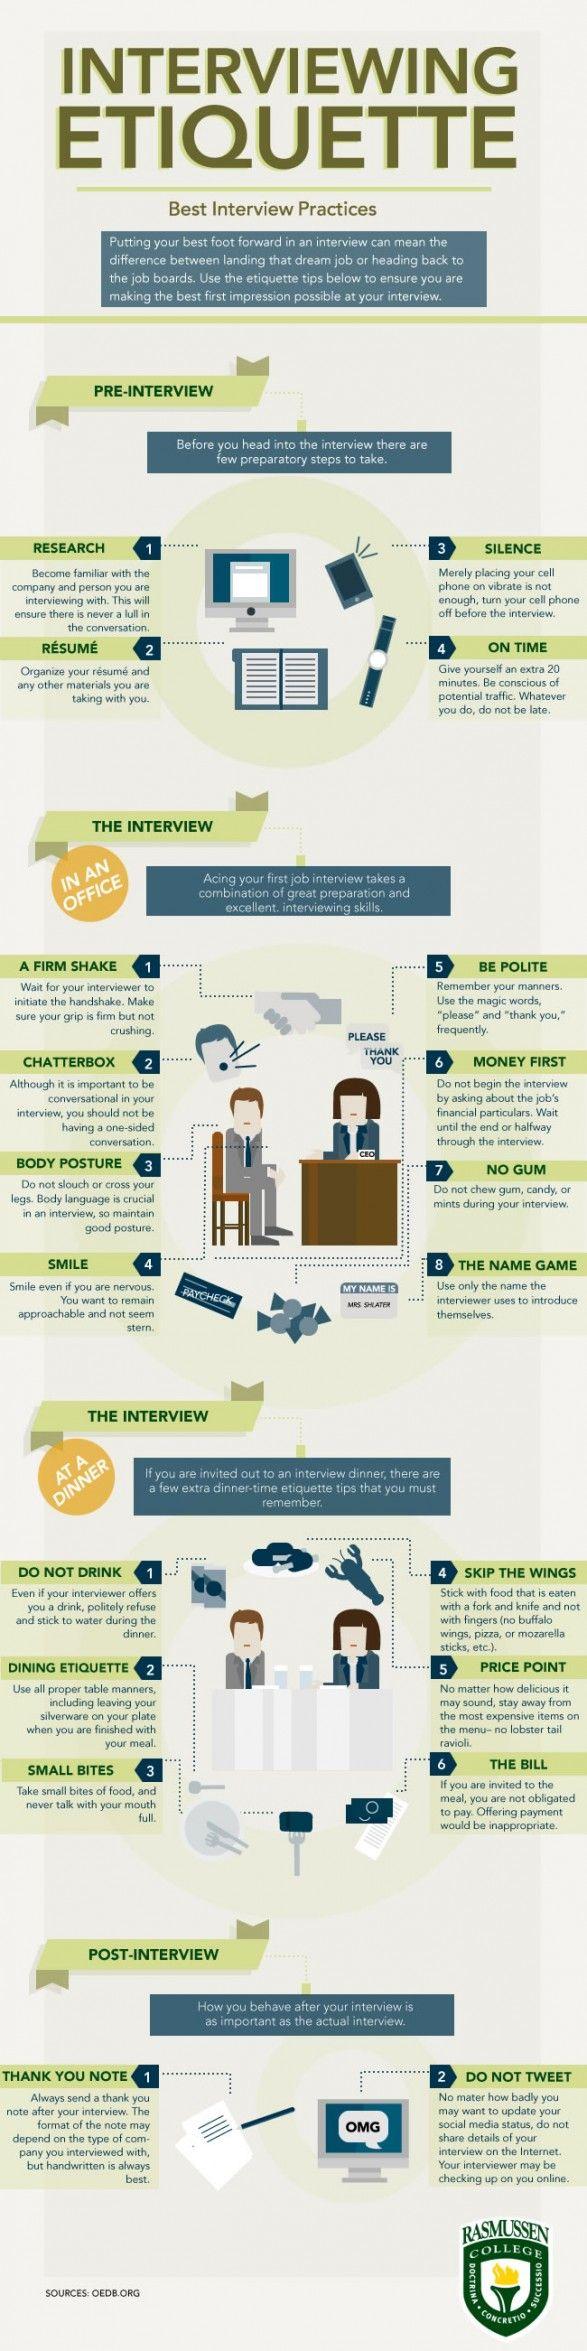 Interviewing etiquette [INFOGRAPHIC] #Interview #Career #Job